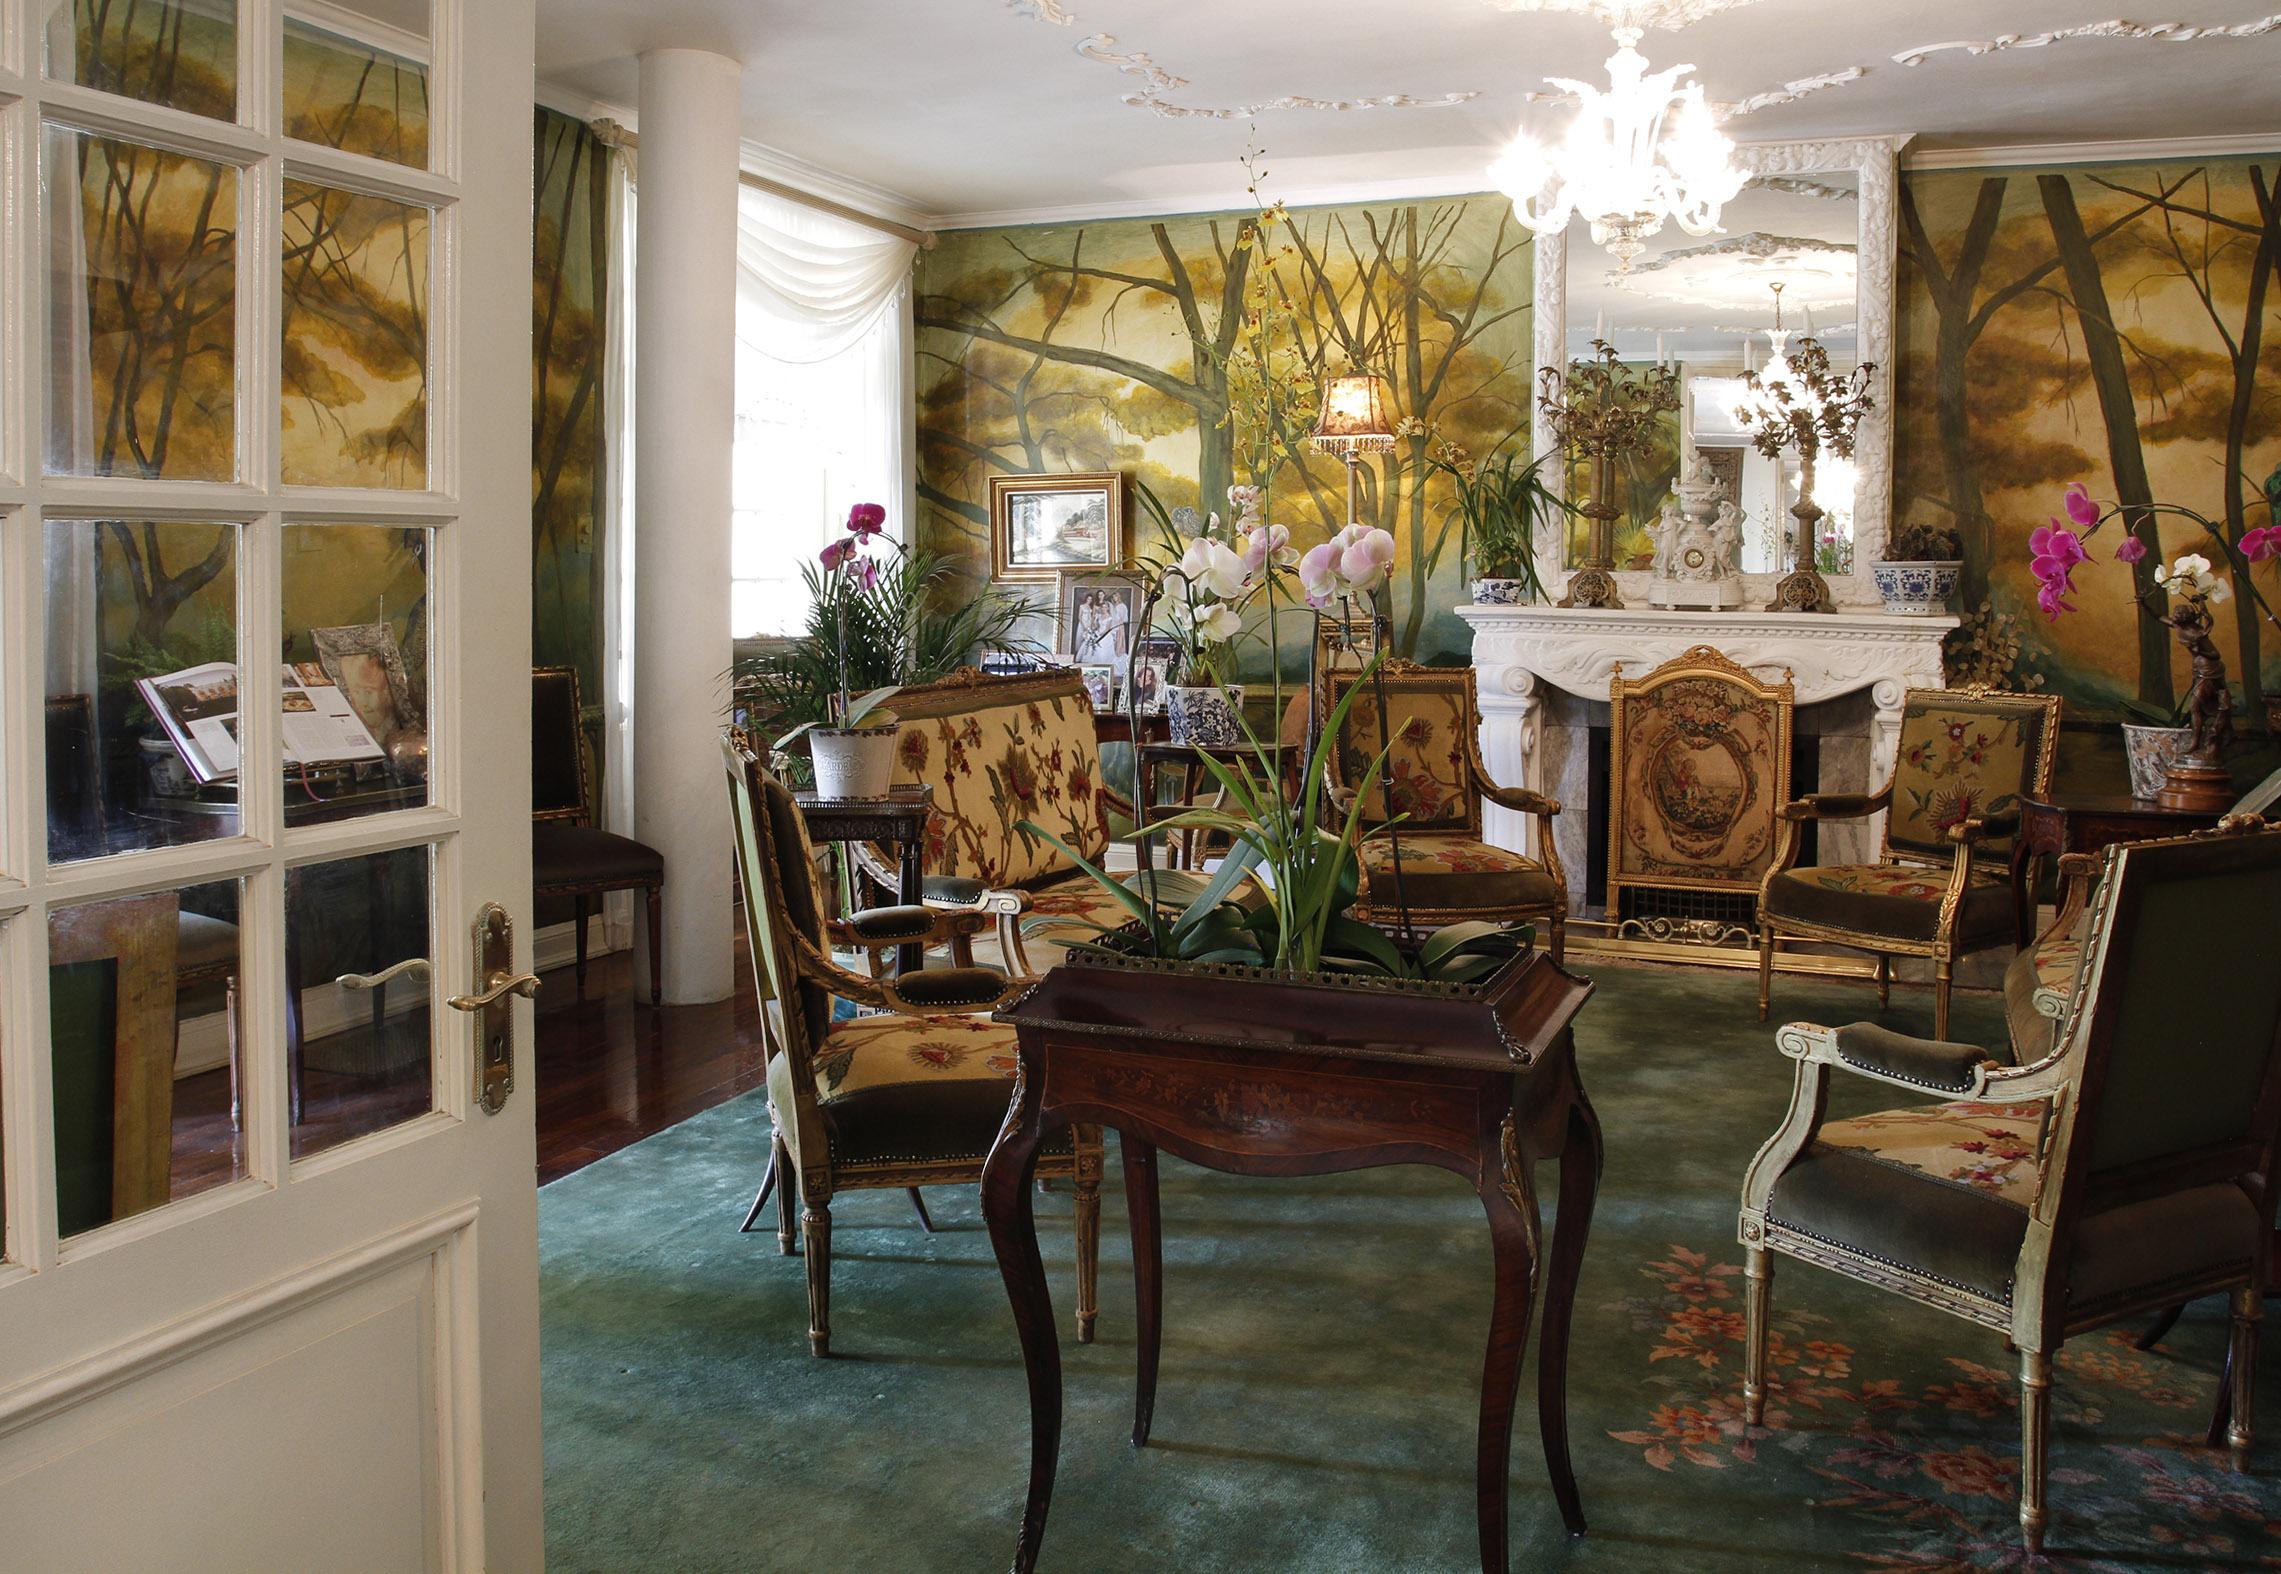 Illyria house boutique hotel spa haute grandeur for Boutique hotel gargano